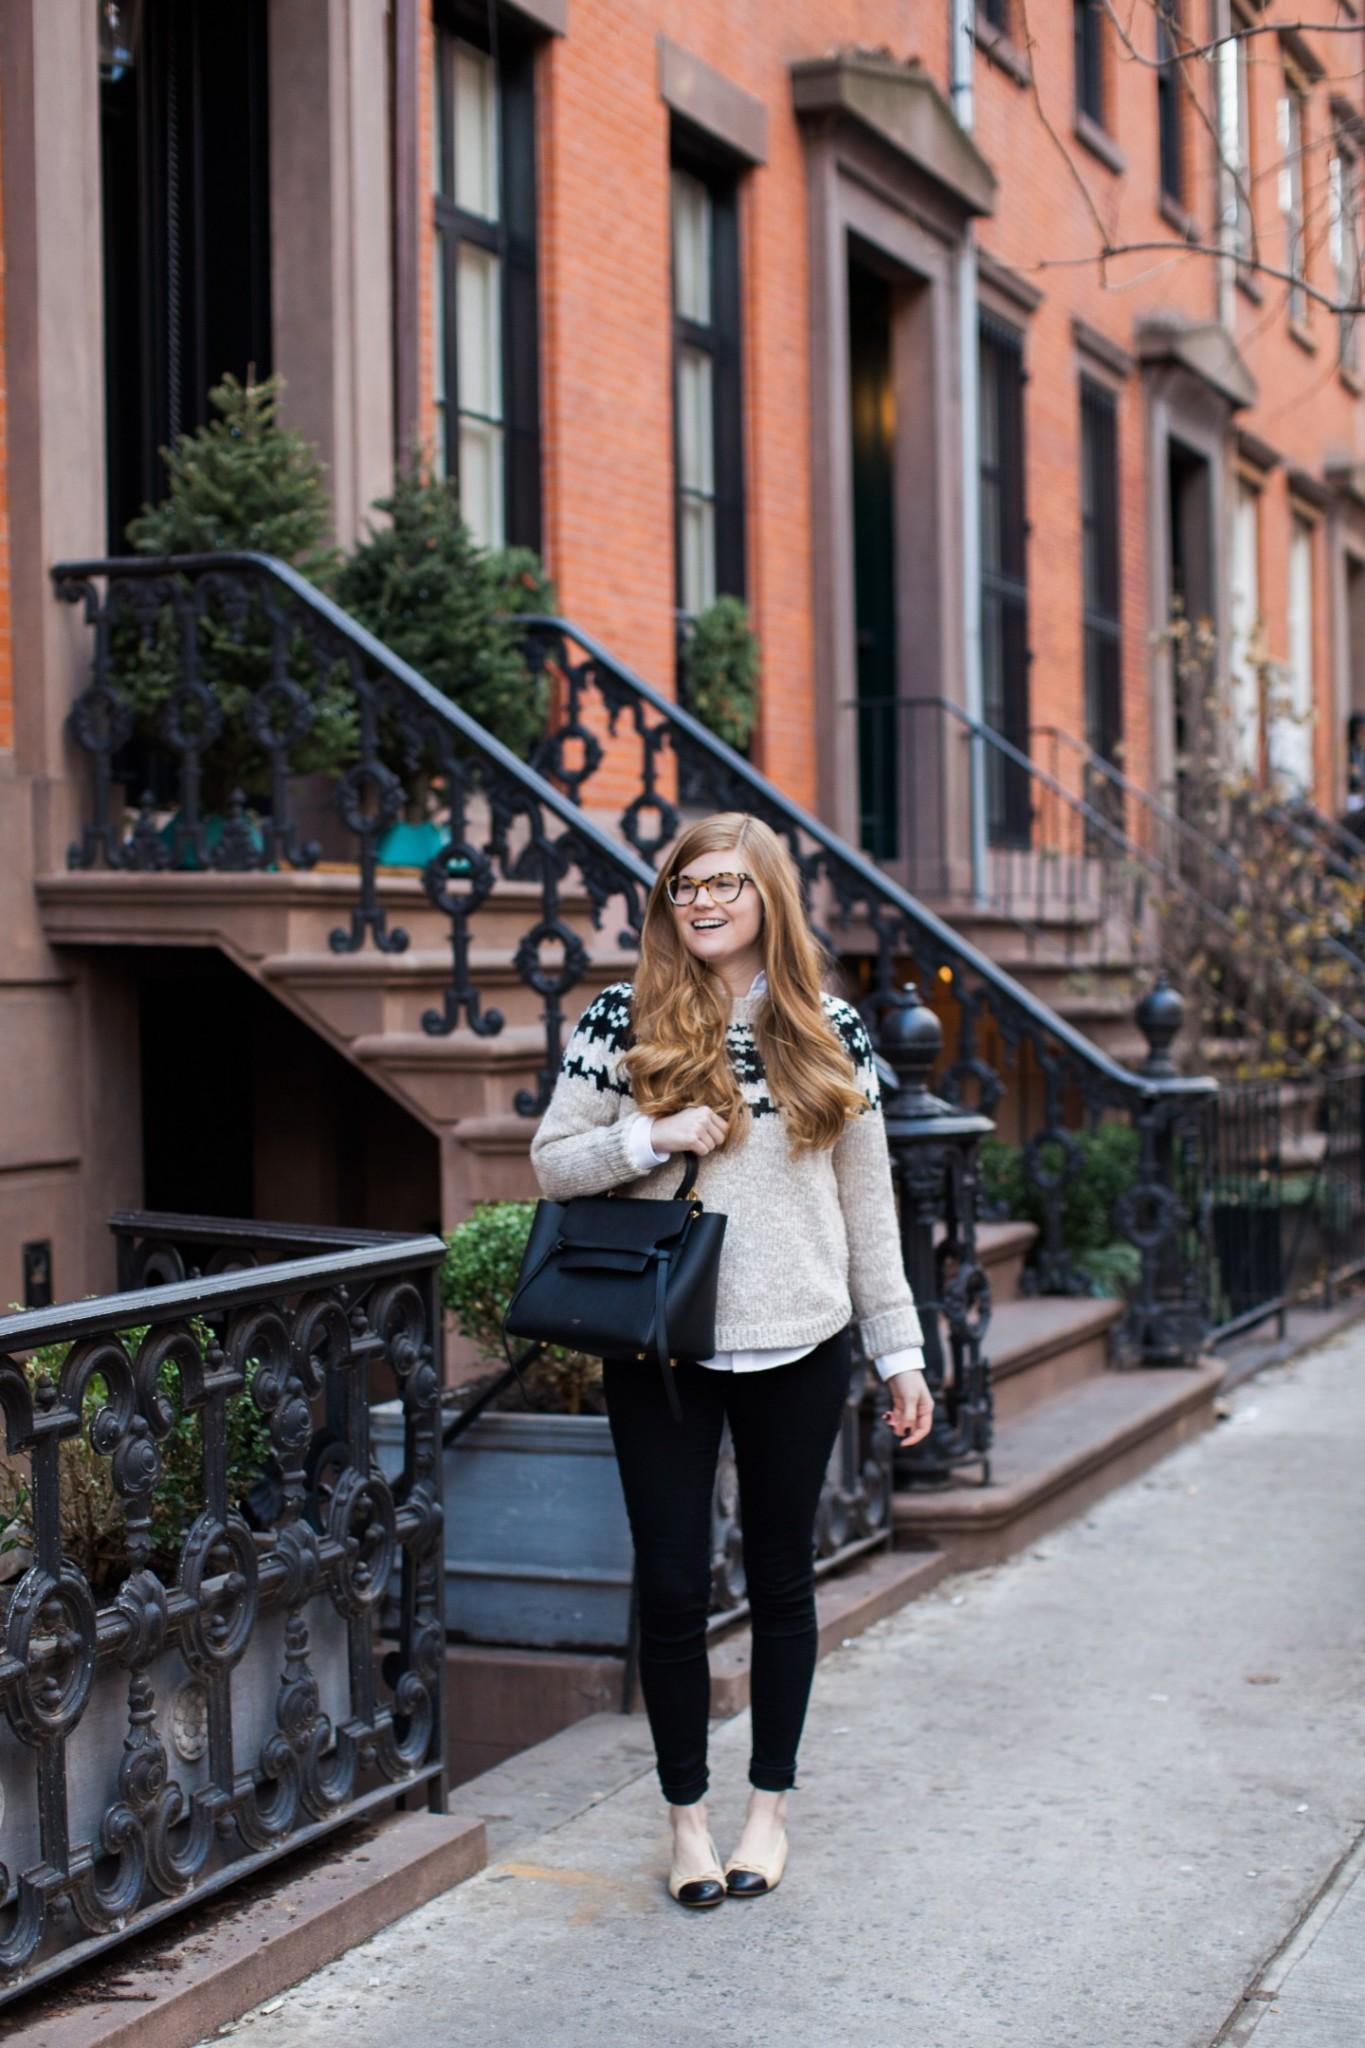 Top London fashion blogger,  Mollie Moore shares her new Havana Prada glasses